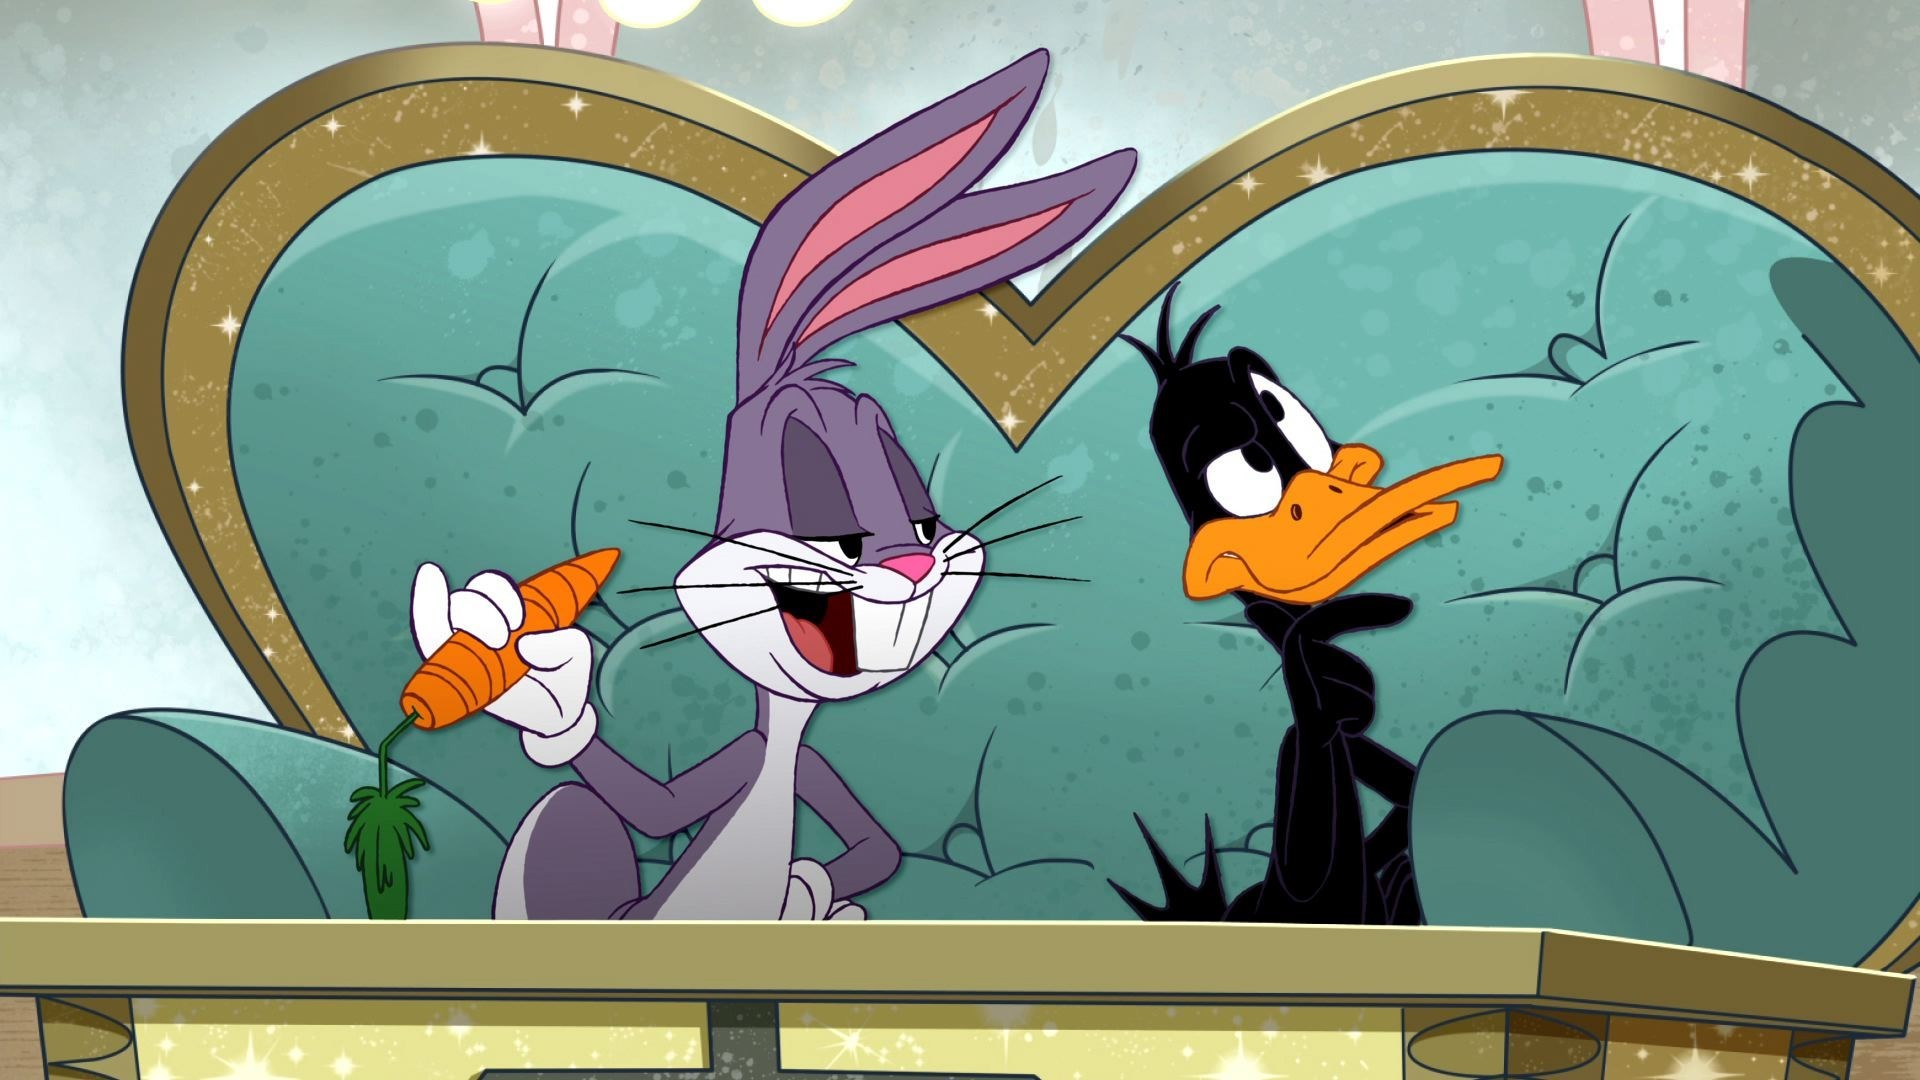 Looney Tunes Wallpaper Screensavers 69 Images